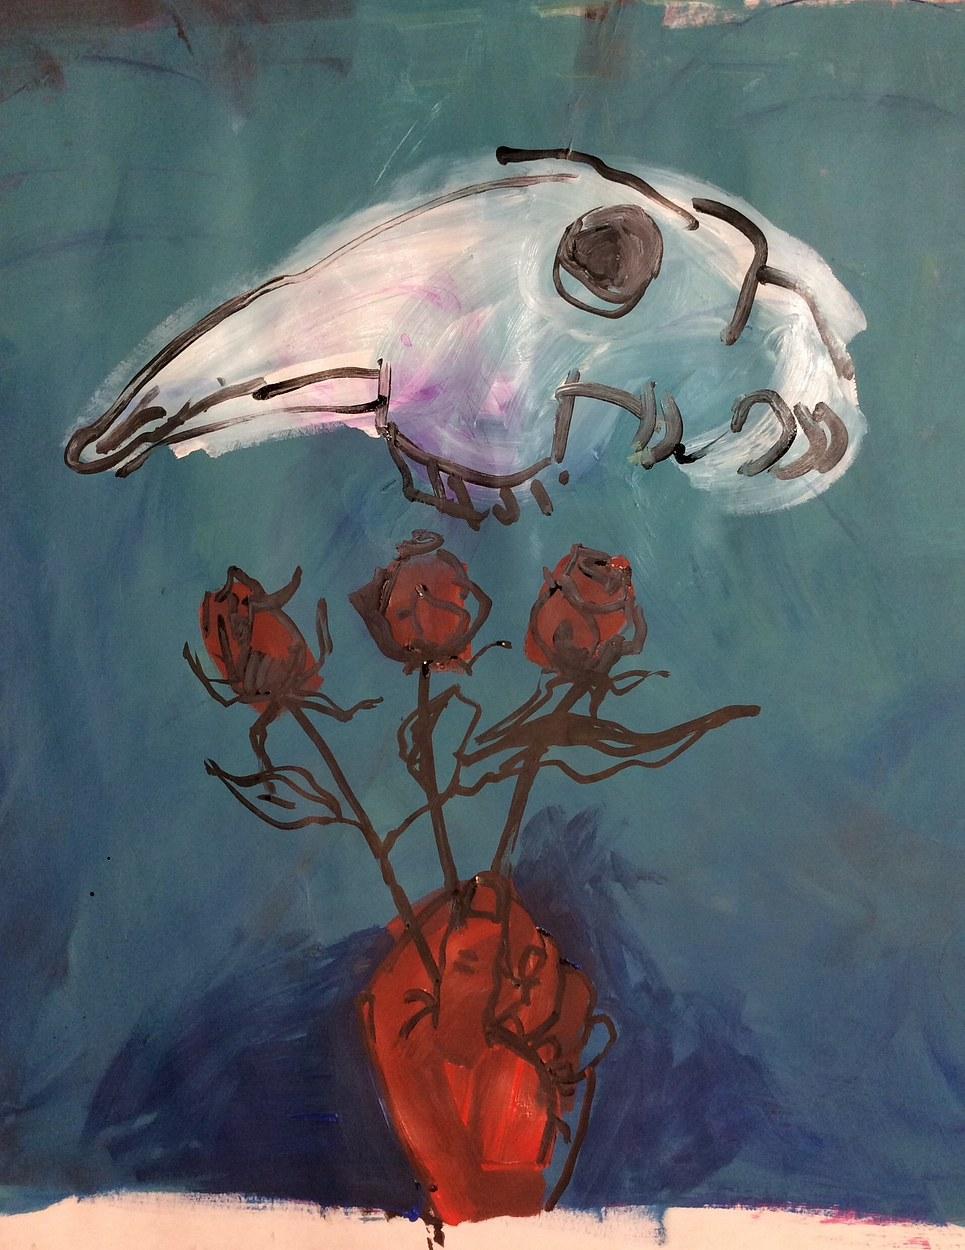 Goat Skull and Roses 2